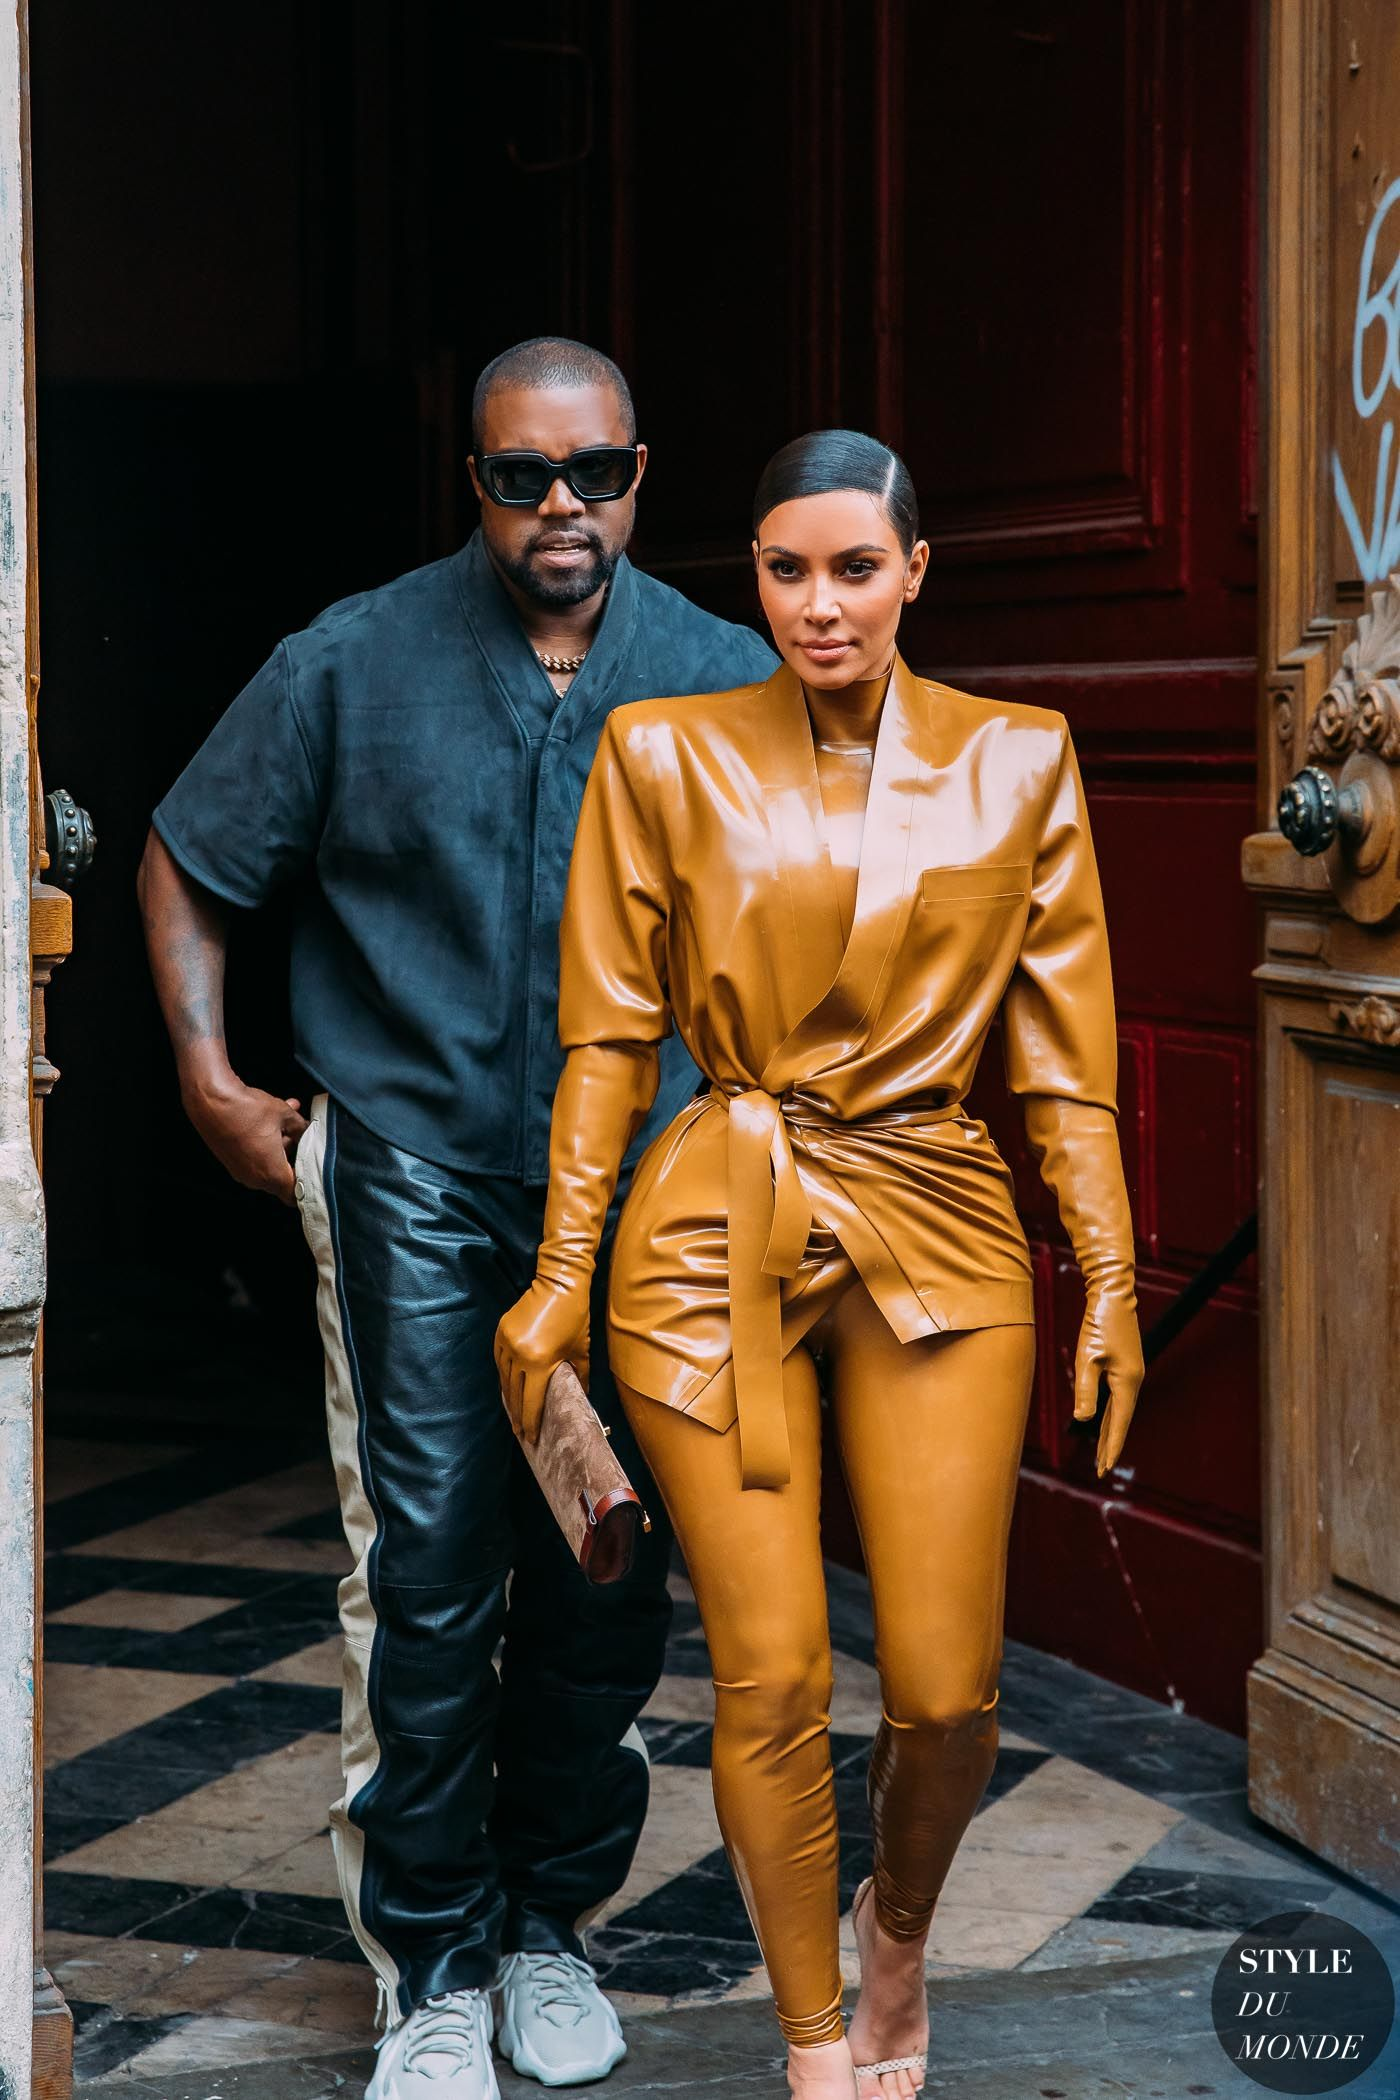 Paris Fw 2020 Street Style Kanye West And Kim Kardashian Style Du Monde Street Style Street F In 2020 Kim Kardashian Outfits Kim Kardashian Style Kanye West Style